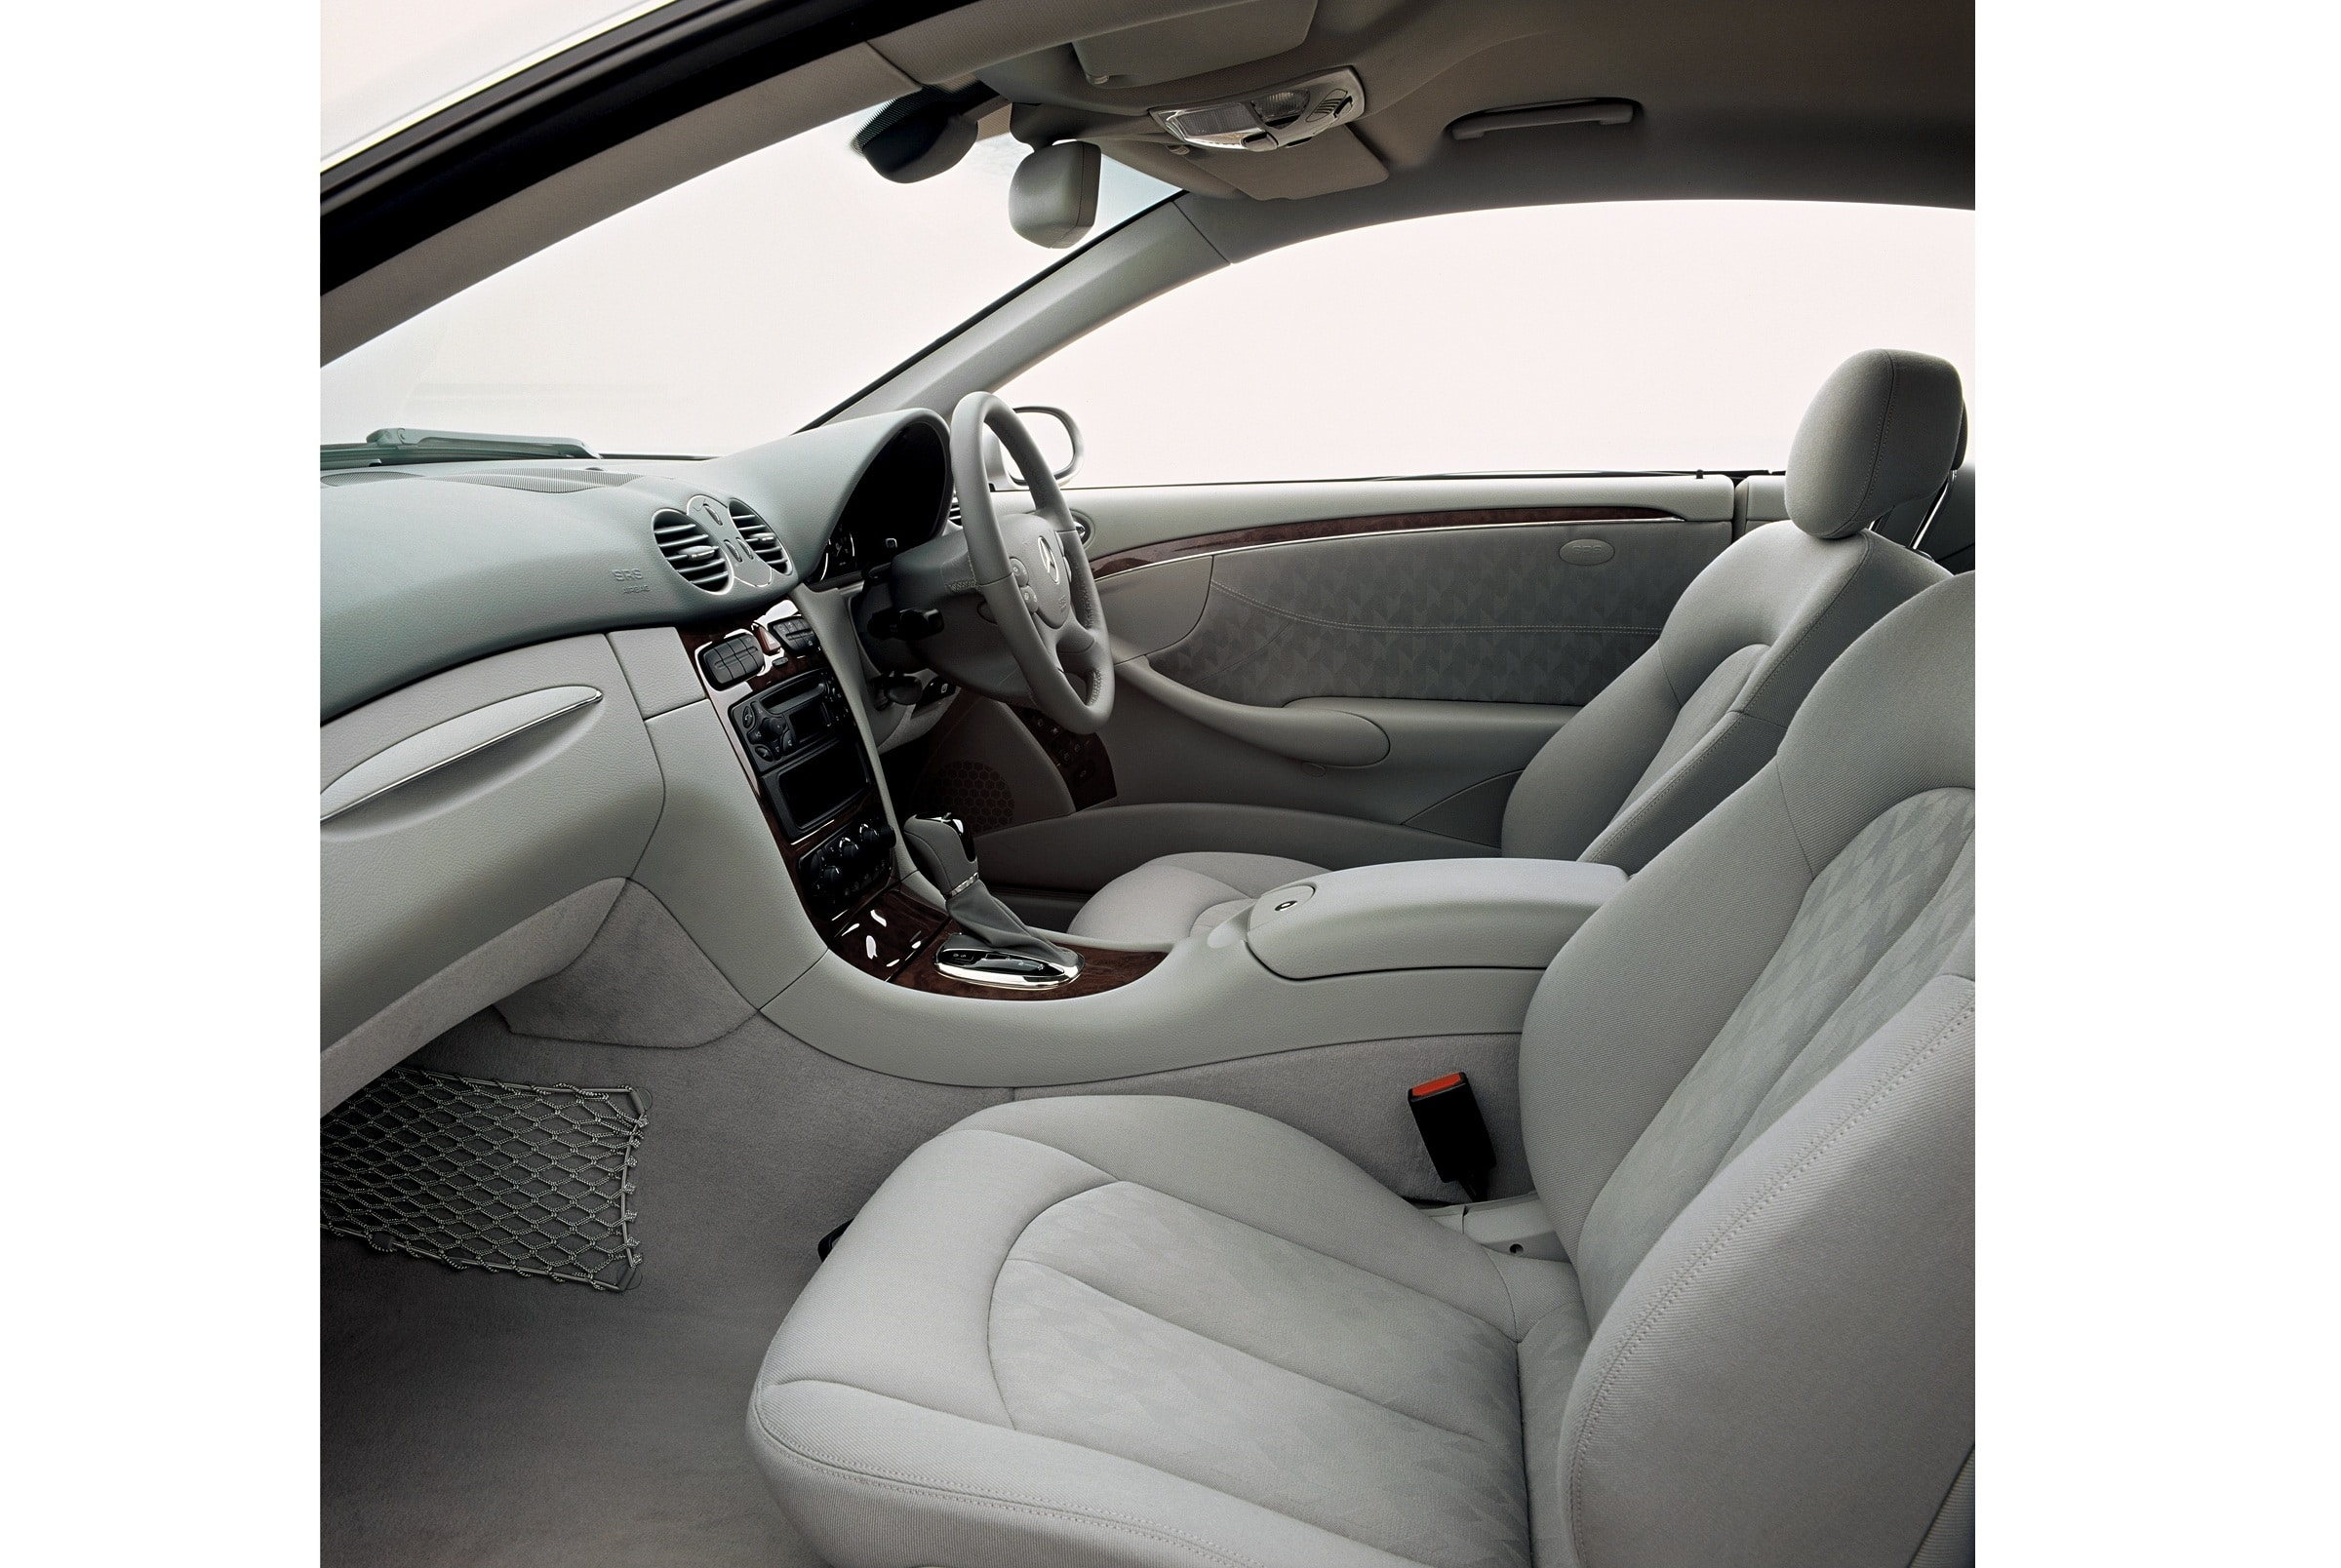 mercedes-benz clk, mercedes-benz, clk, mercedes, w209, c209, coupe, motoring, automotive, car, cars, classic car, retro car, ebay motors, autotrader, german car, bmw, audi